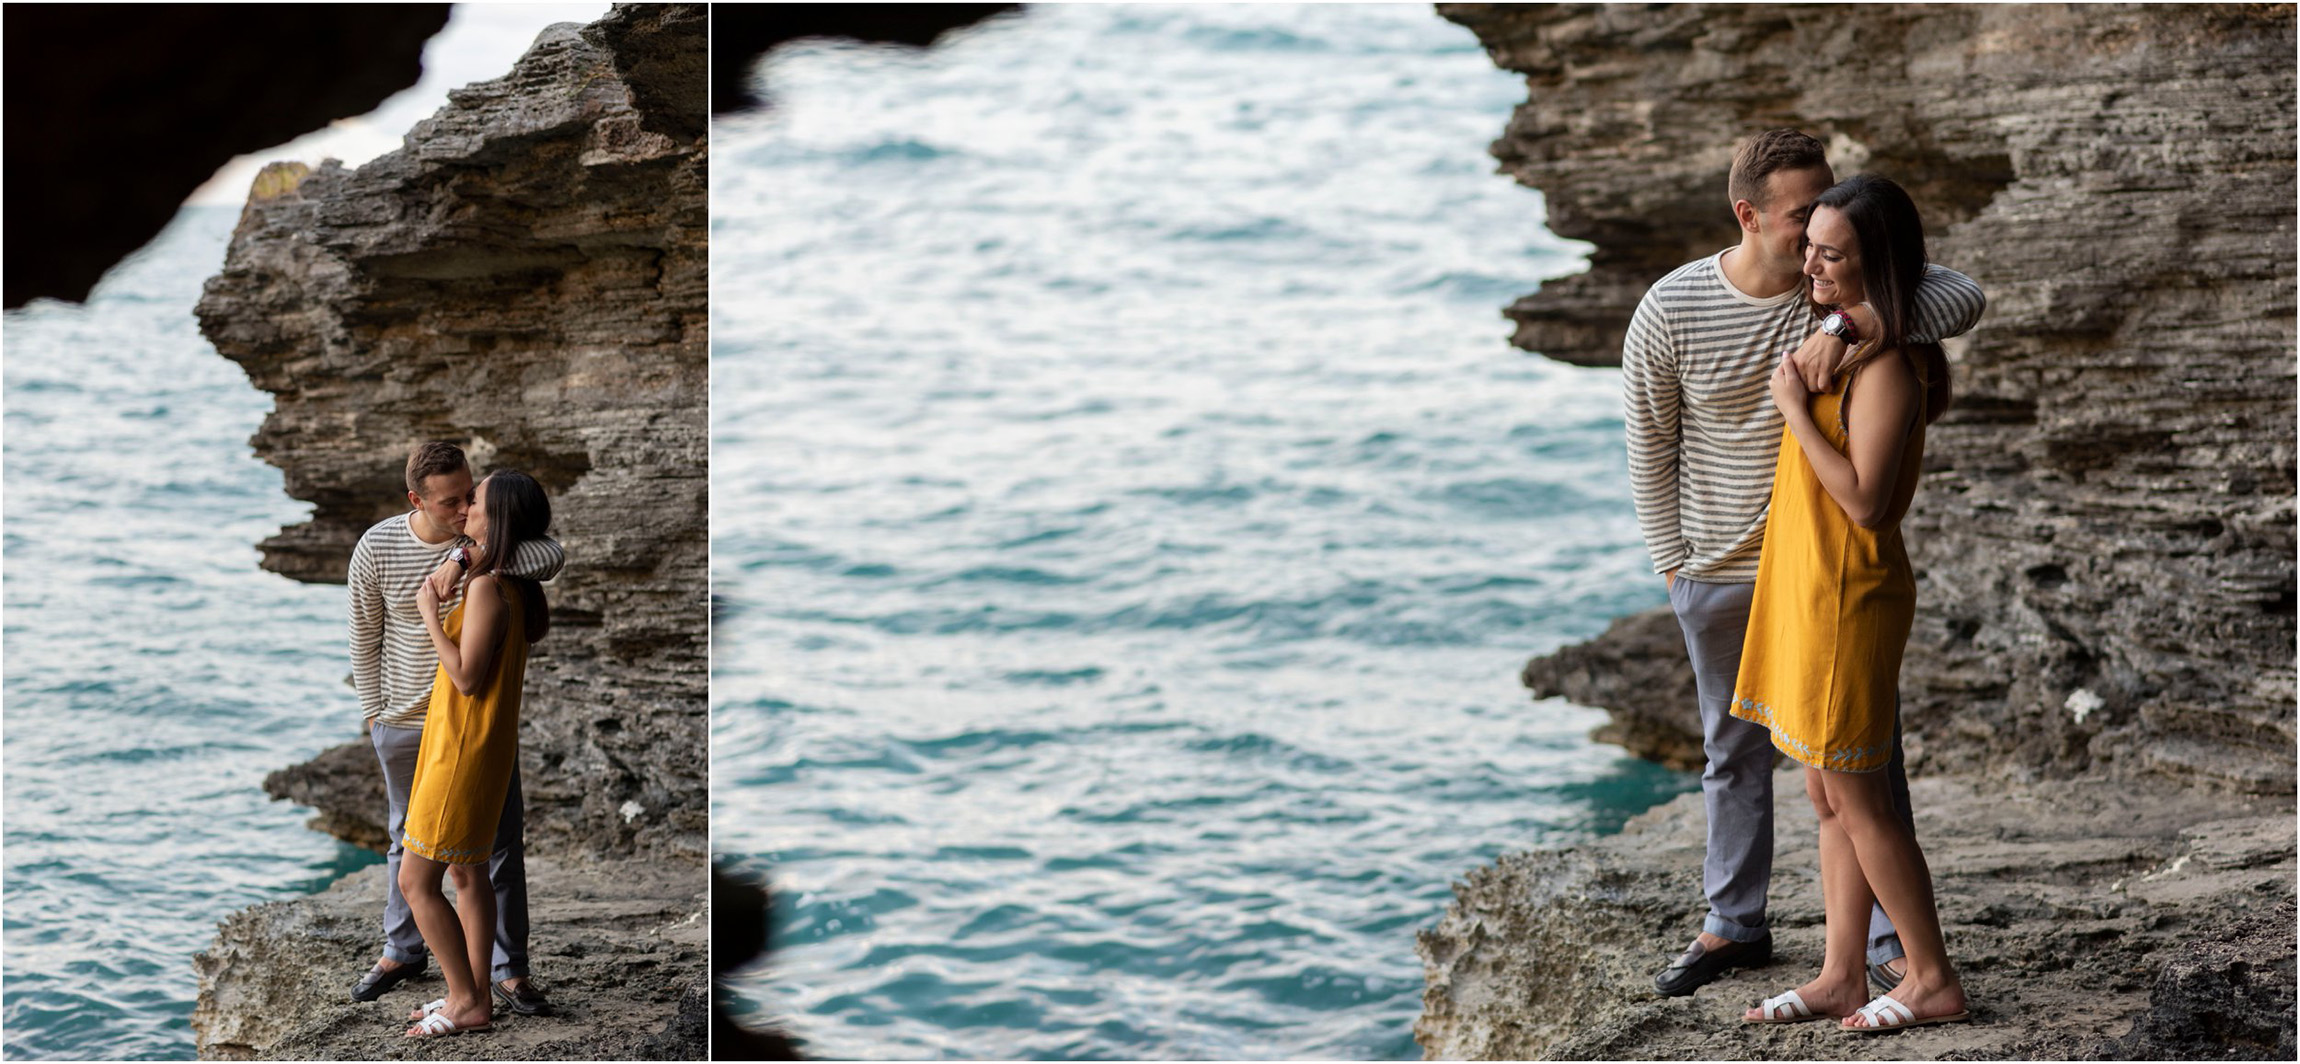 ©FianderFoto_Proposal Photographer_Bermuda_Admiralty House_Kresnick_Rina_022.jpg